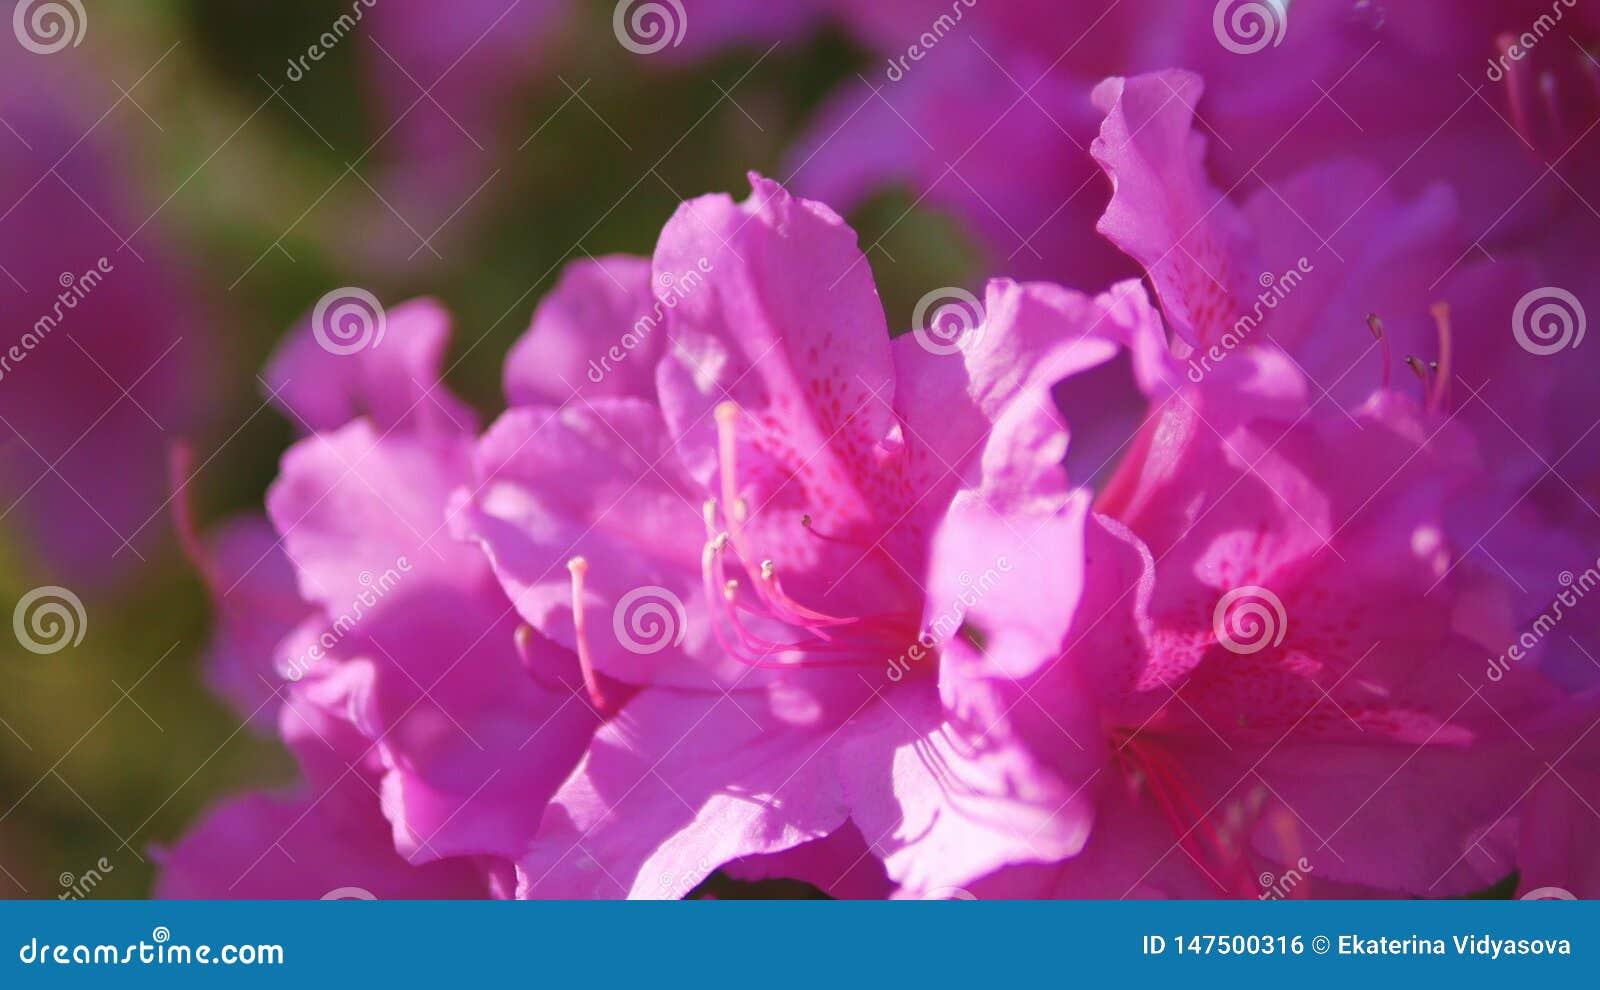 Closeup of pink wild rosemary flowers.